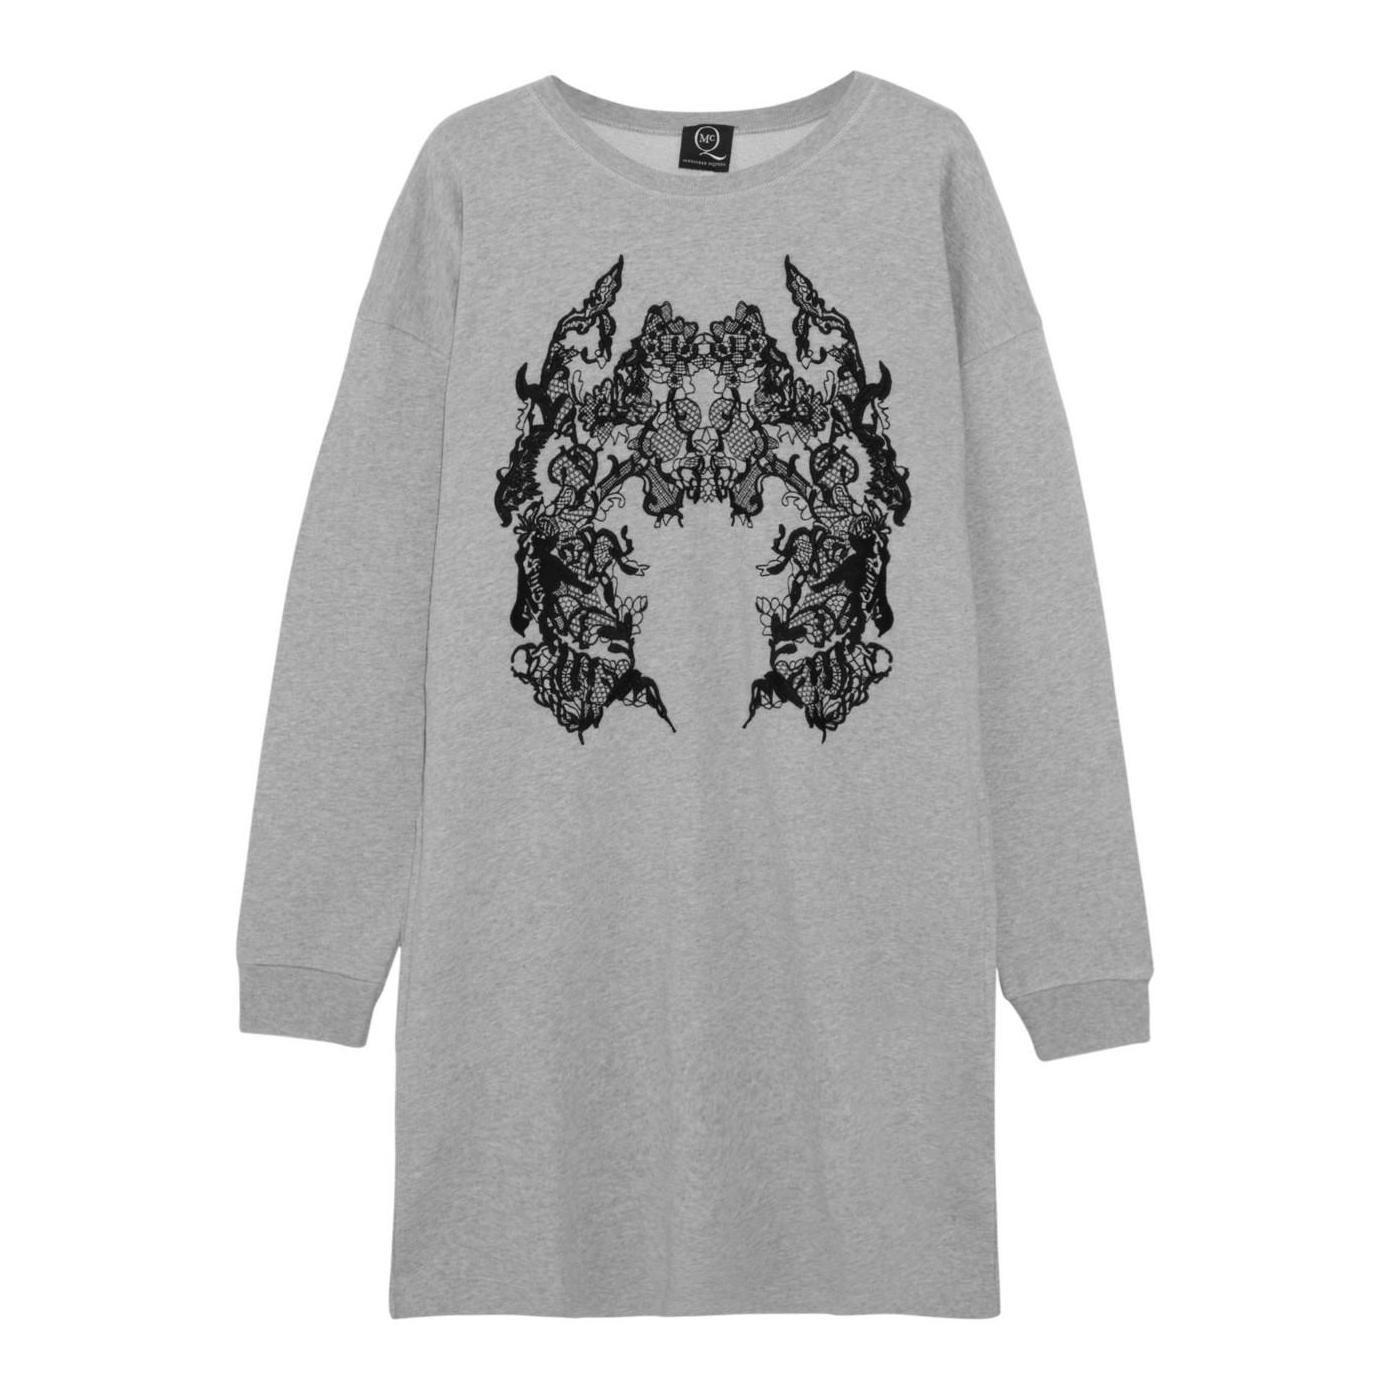 1679-McQ-Alexander-McQueen-women-s-embroidered-cotton